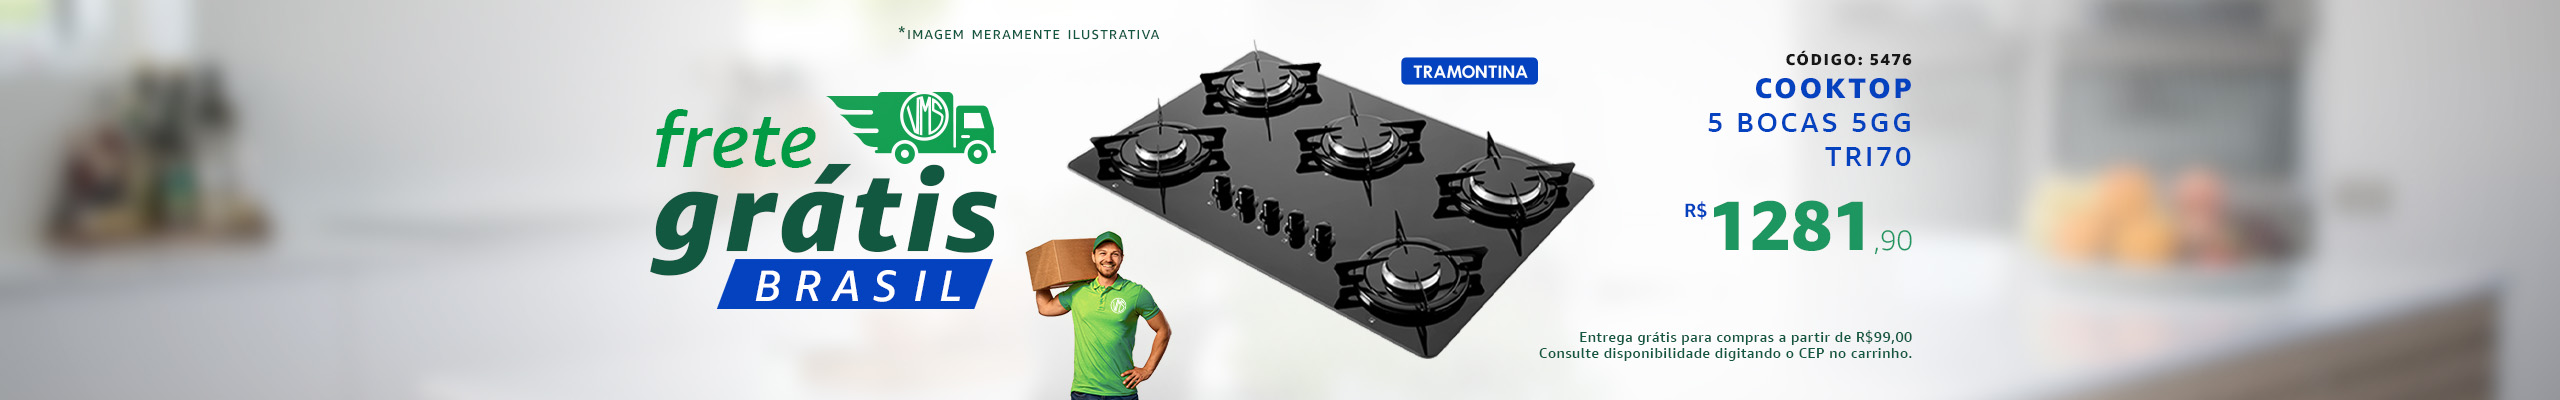 CookTop Tramontina Promoção